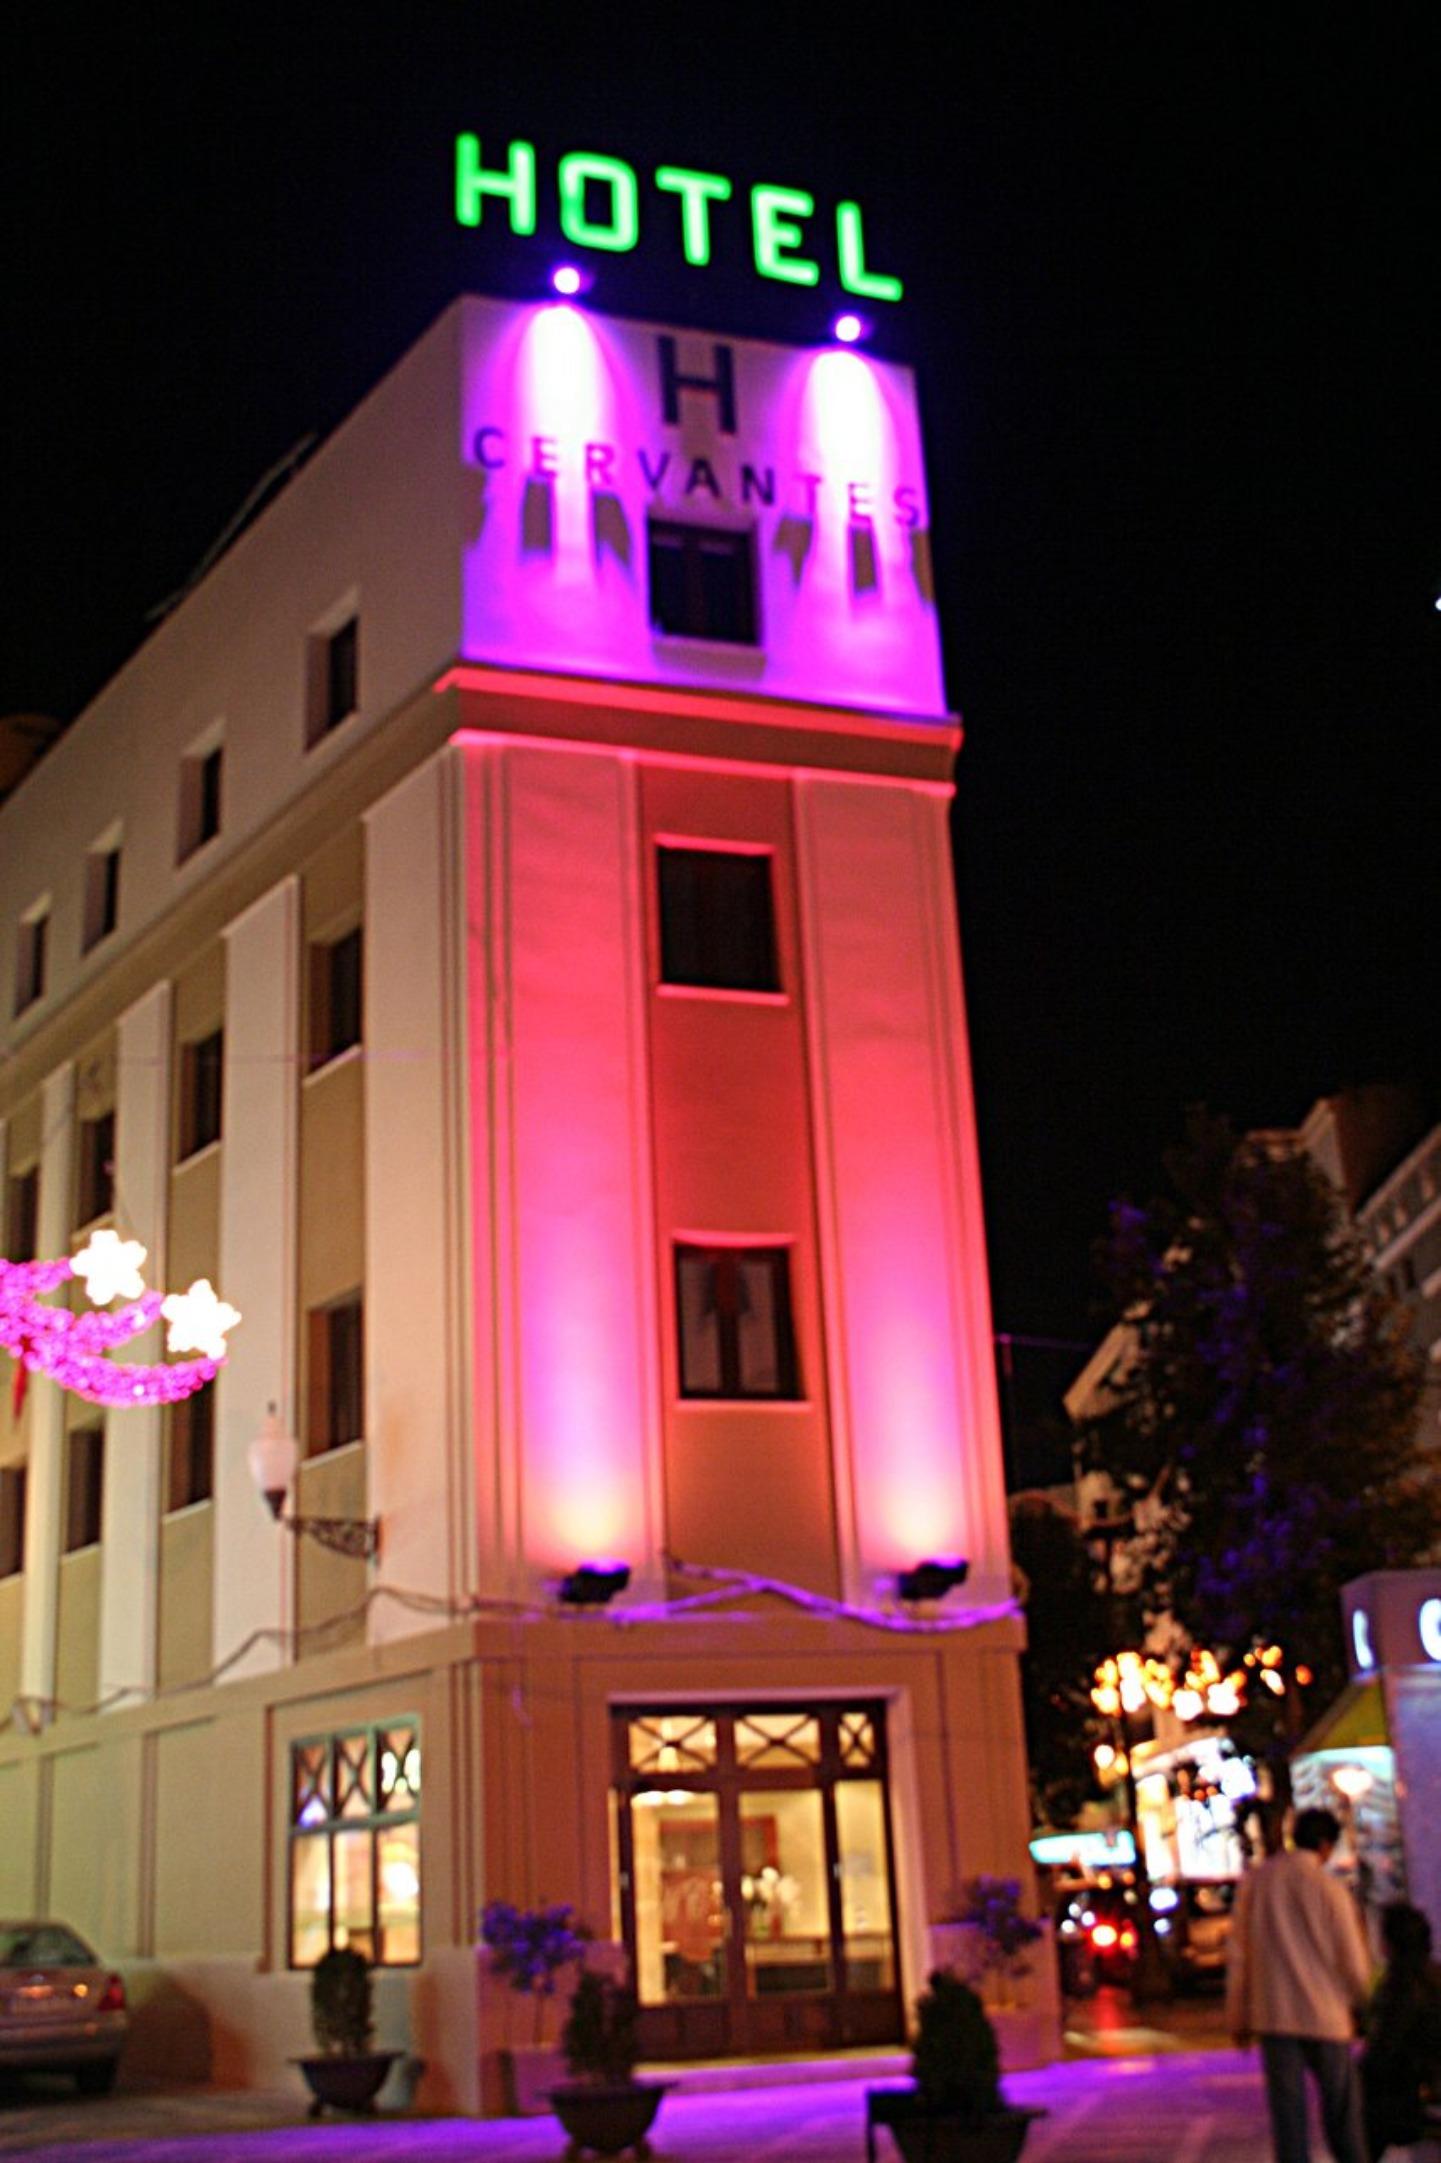 A building with a purple flower at El Cervantes Hotel.